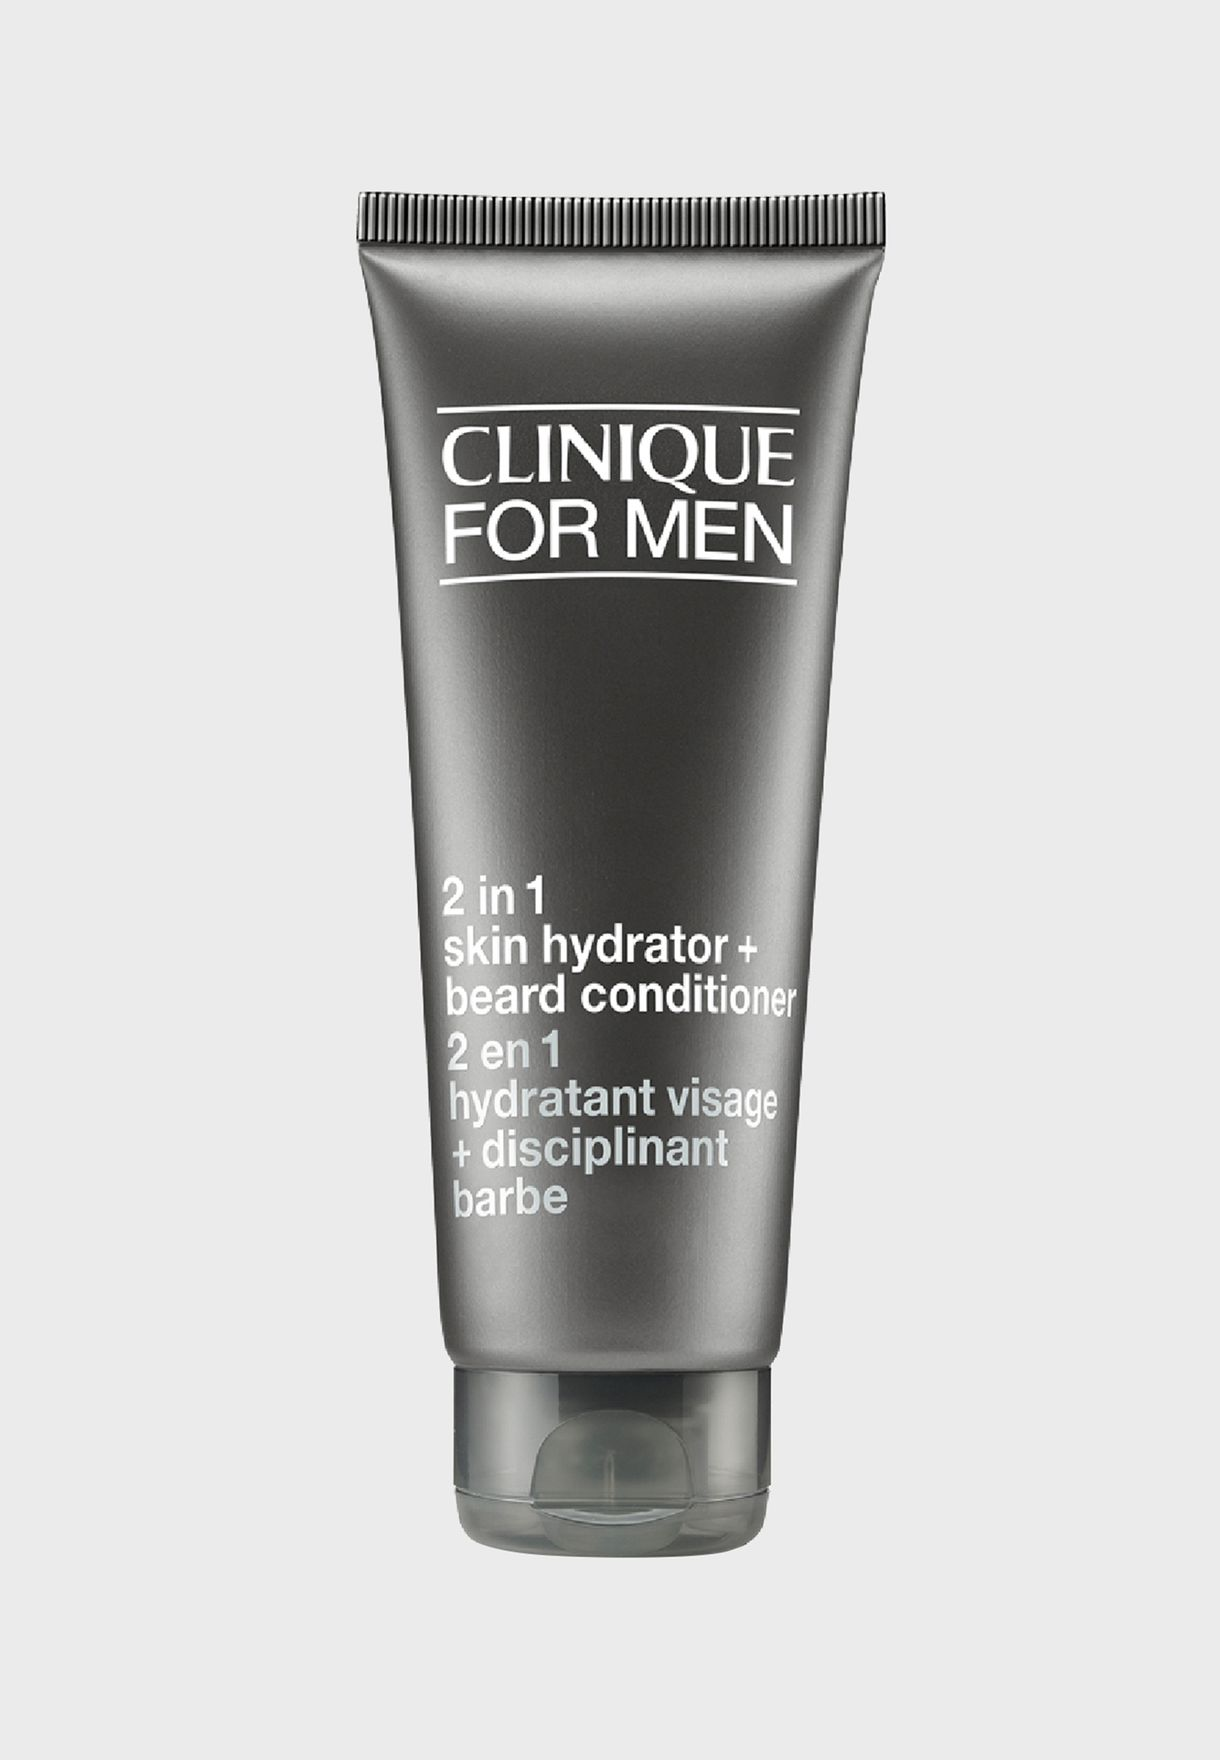 2 in 1 Skin Hydrator For Men 100ml